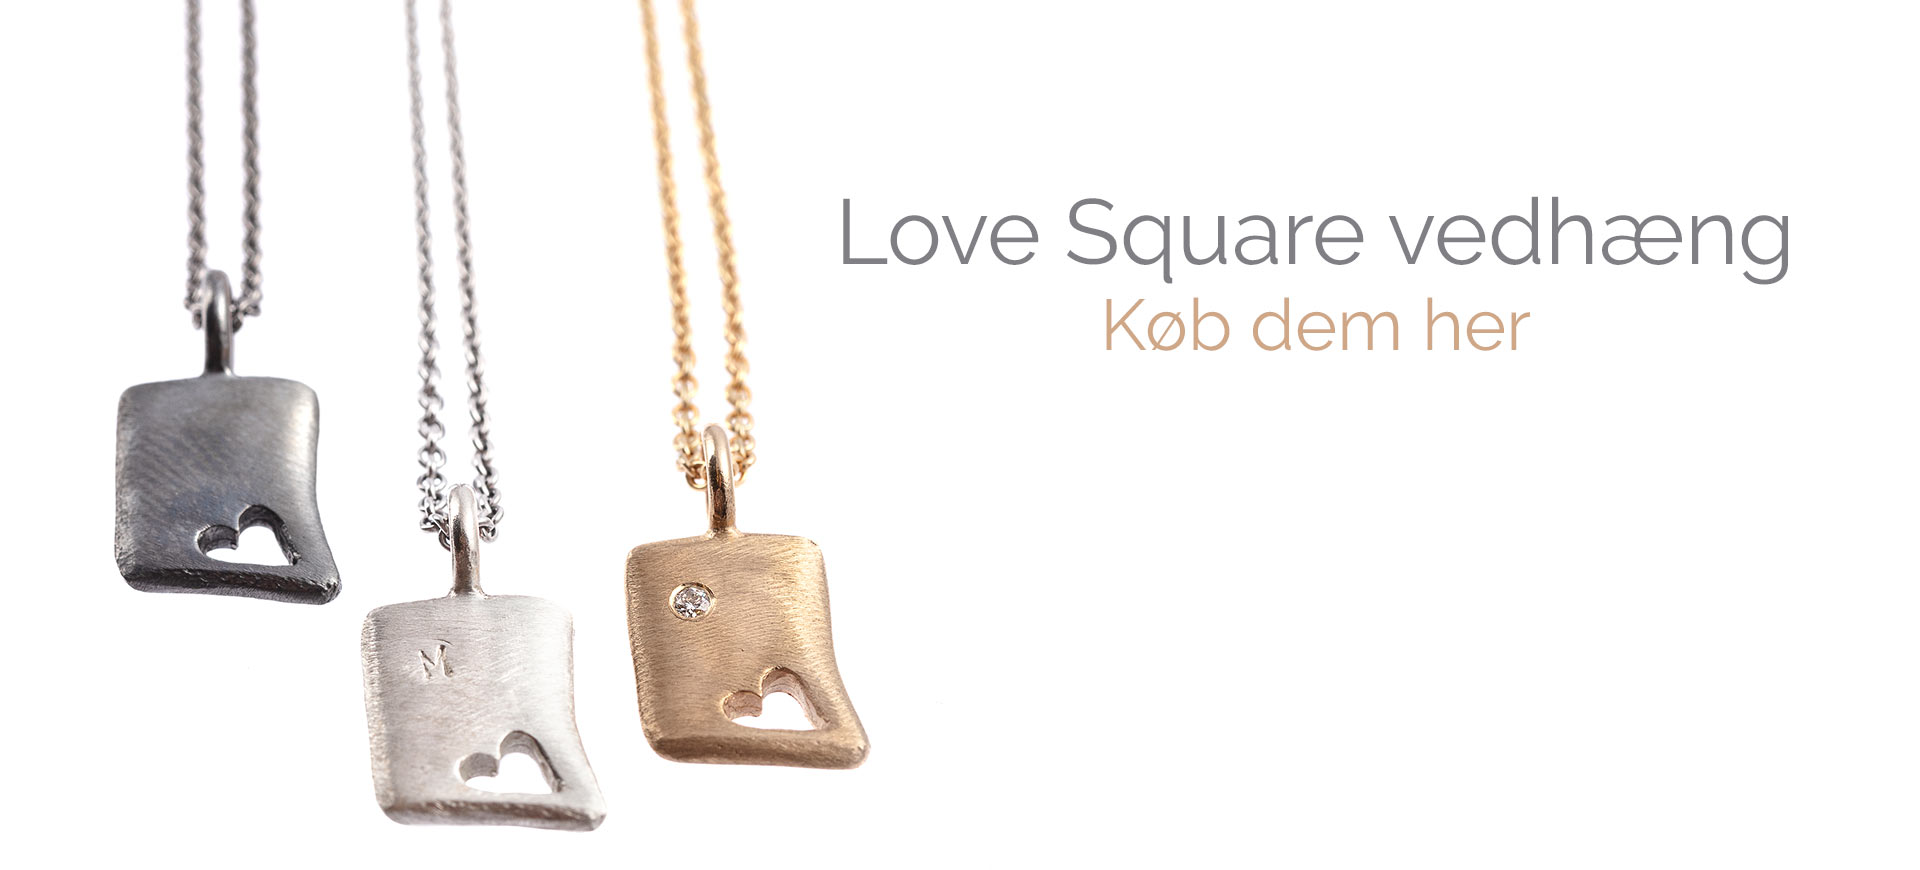 love-square-vedhaeng-koeb-dem-her